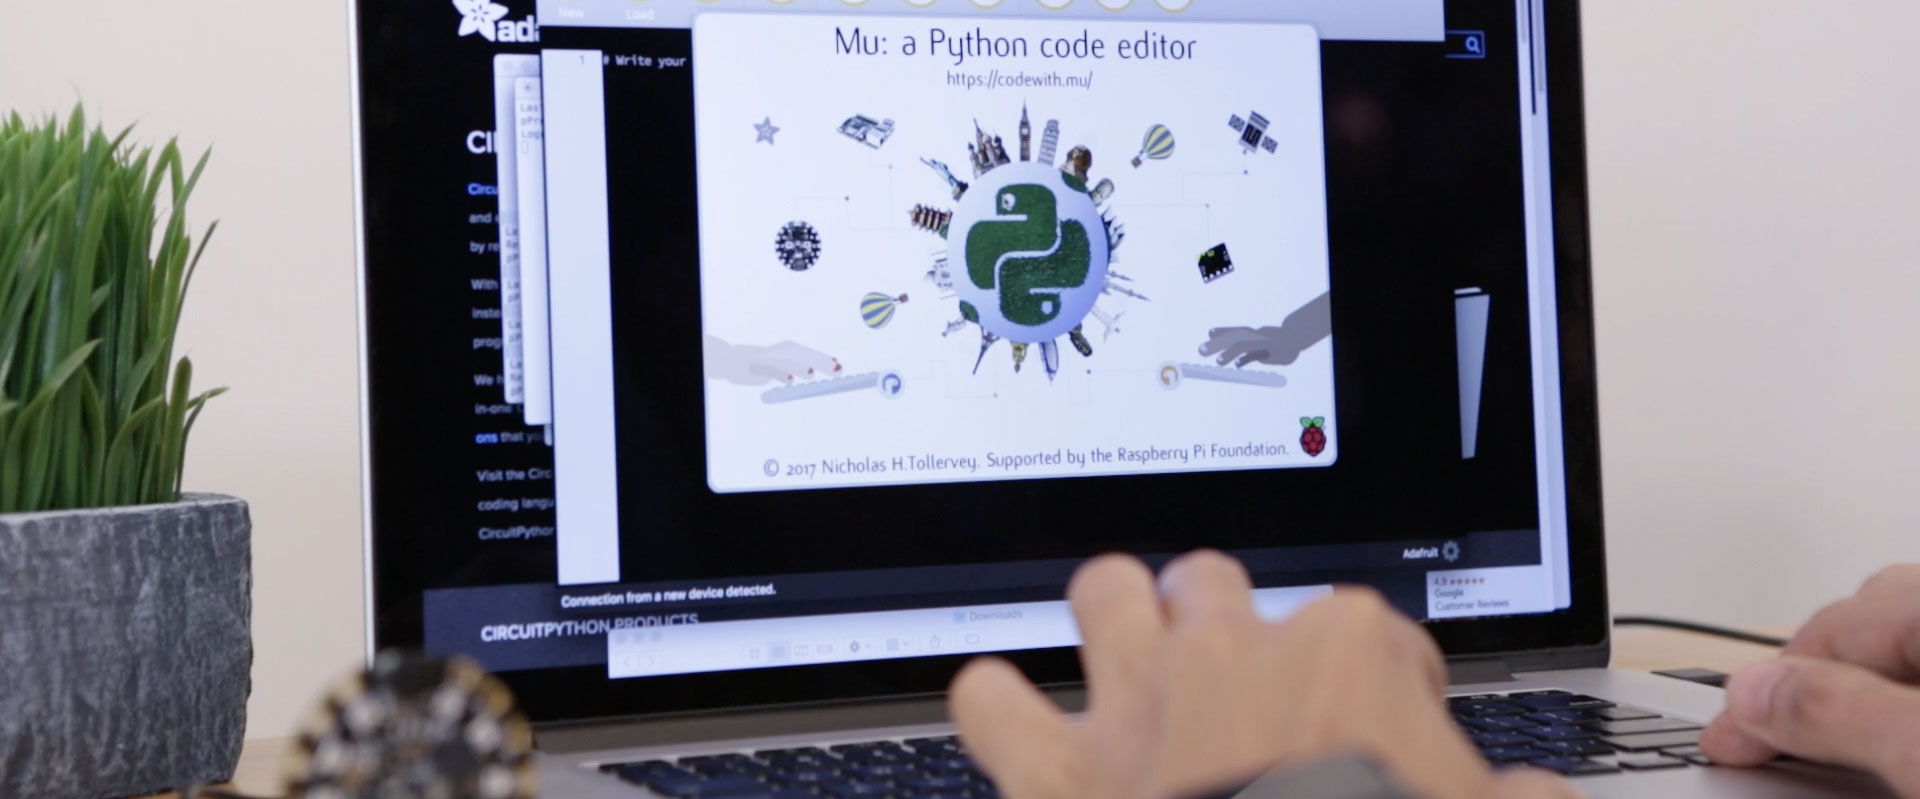 3d_printing_mu-python-editor.jpg